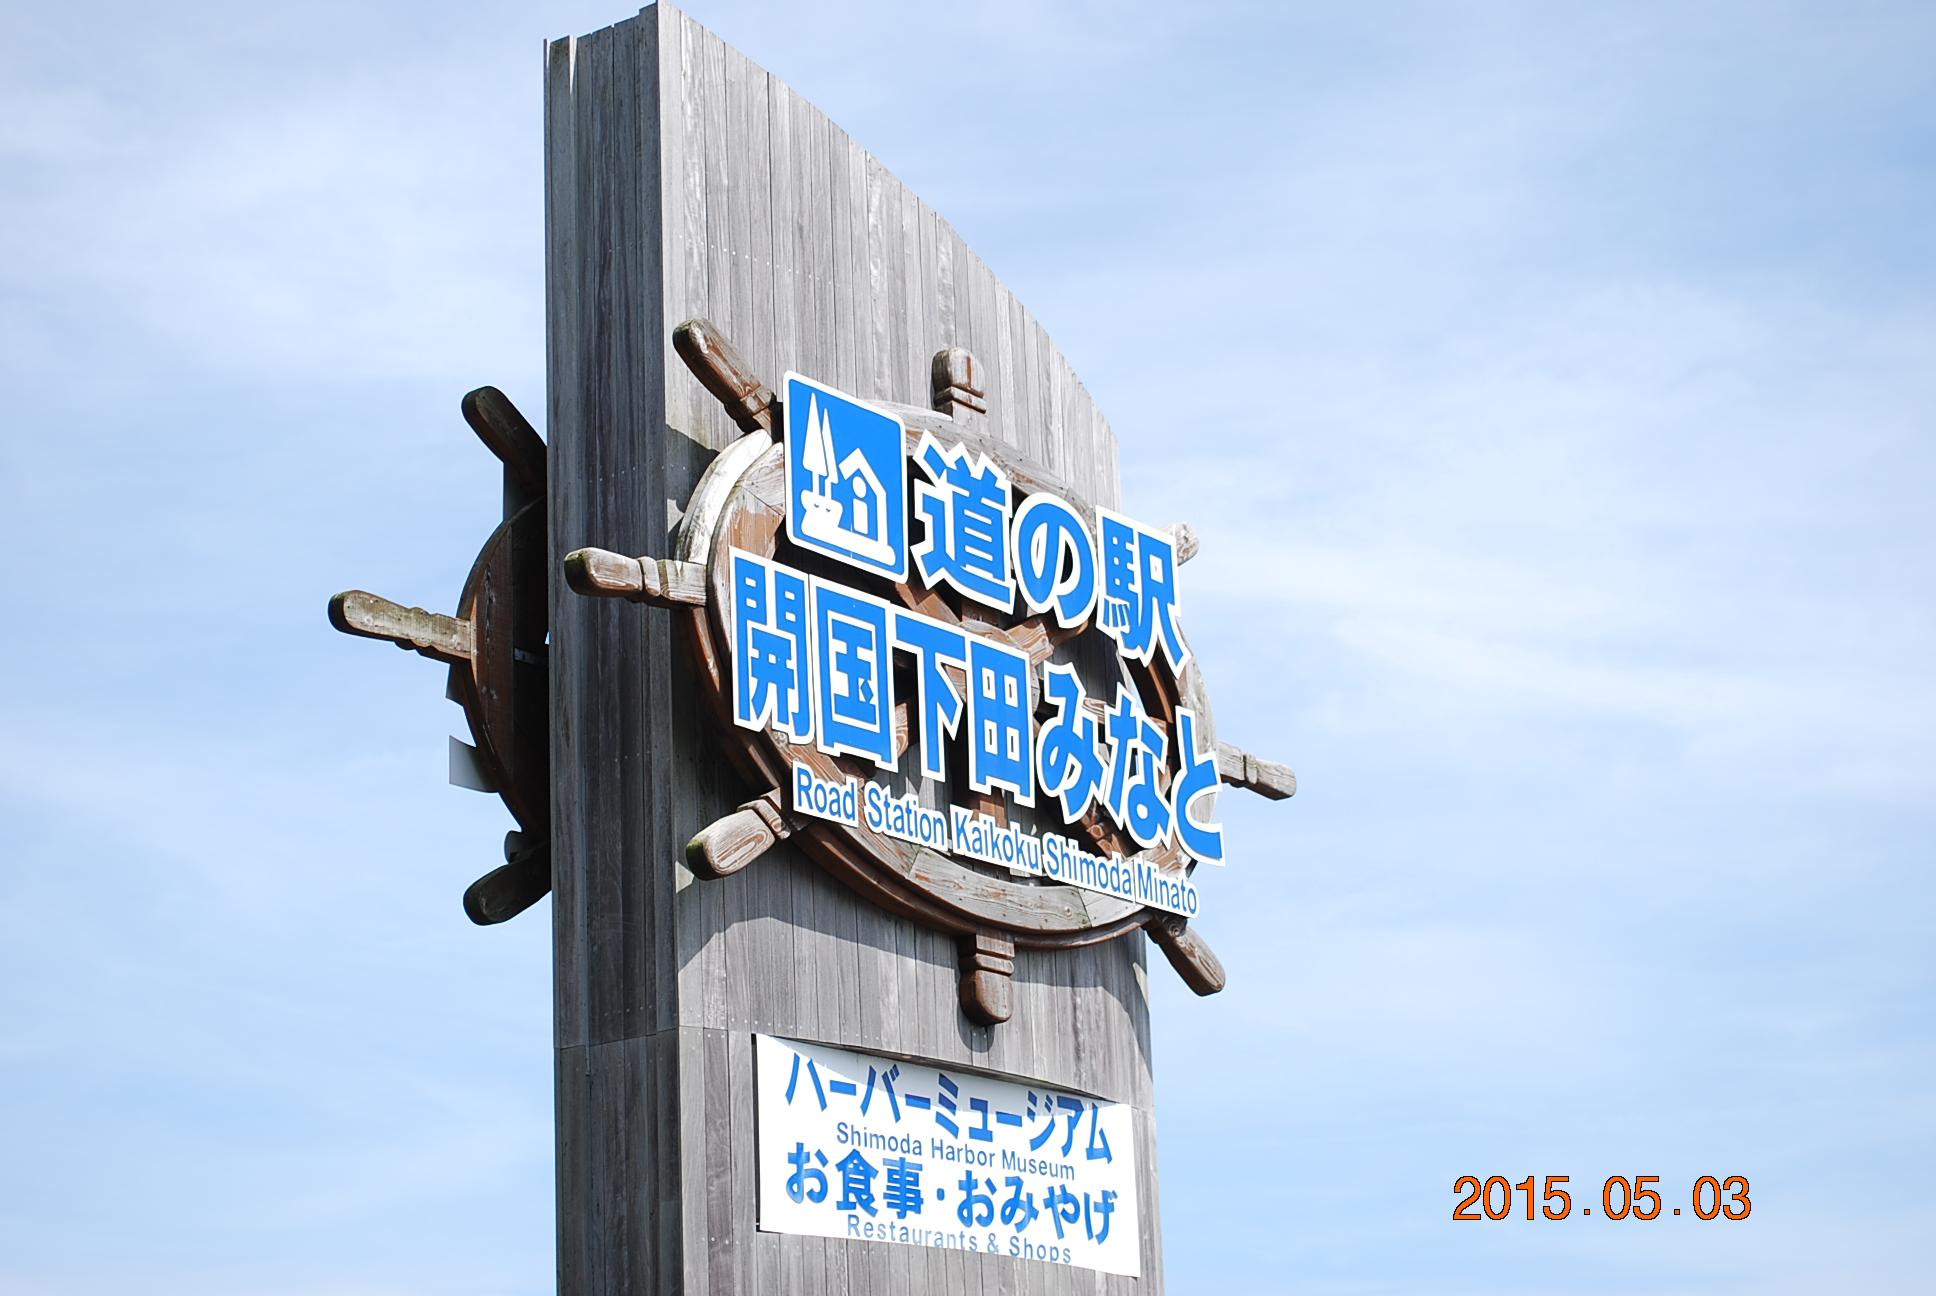 2015_0503_141328-DSC_4255.jpg